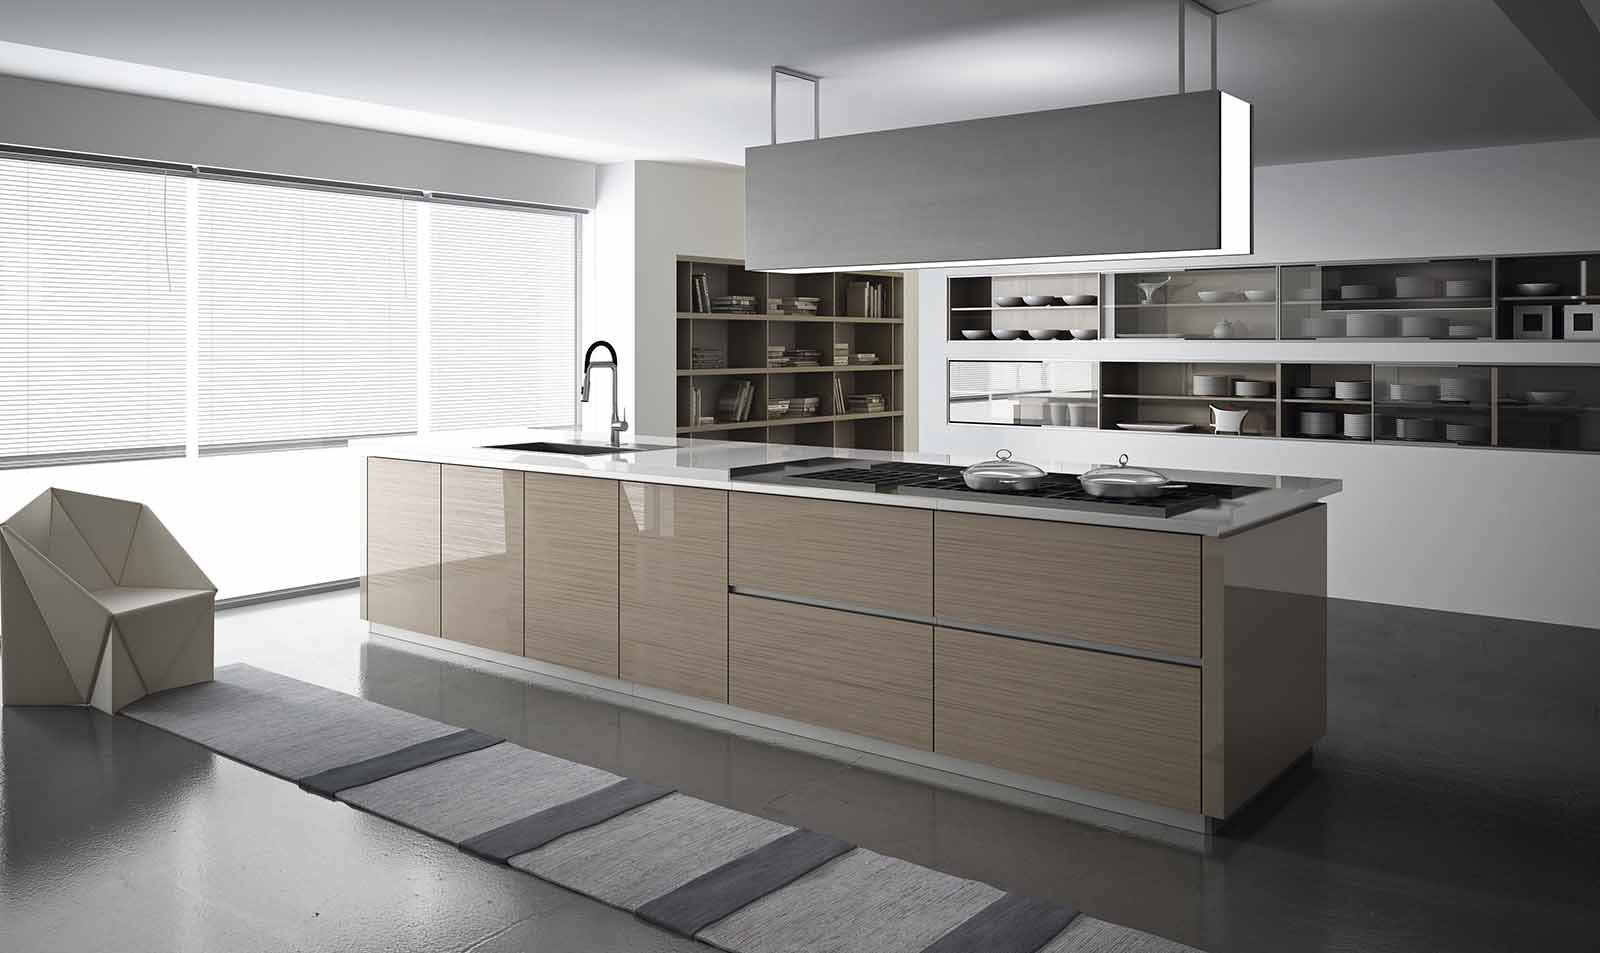 Cocina 11 cocinas capis dise o y fabricaci n de cocinas - Configurador de cocinas ...